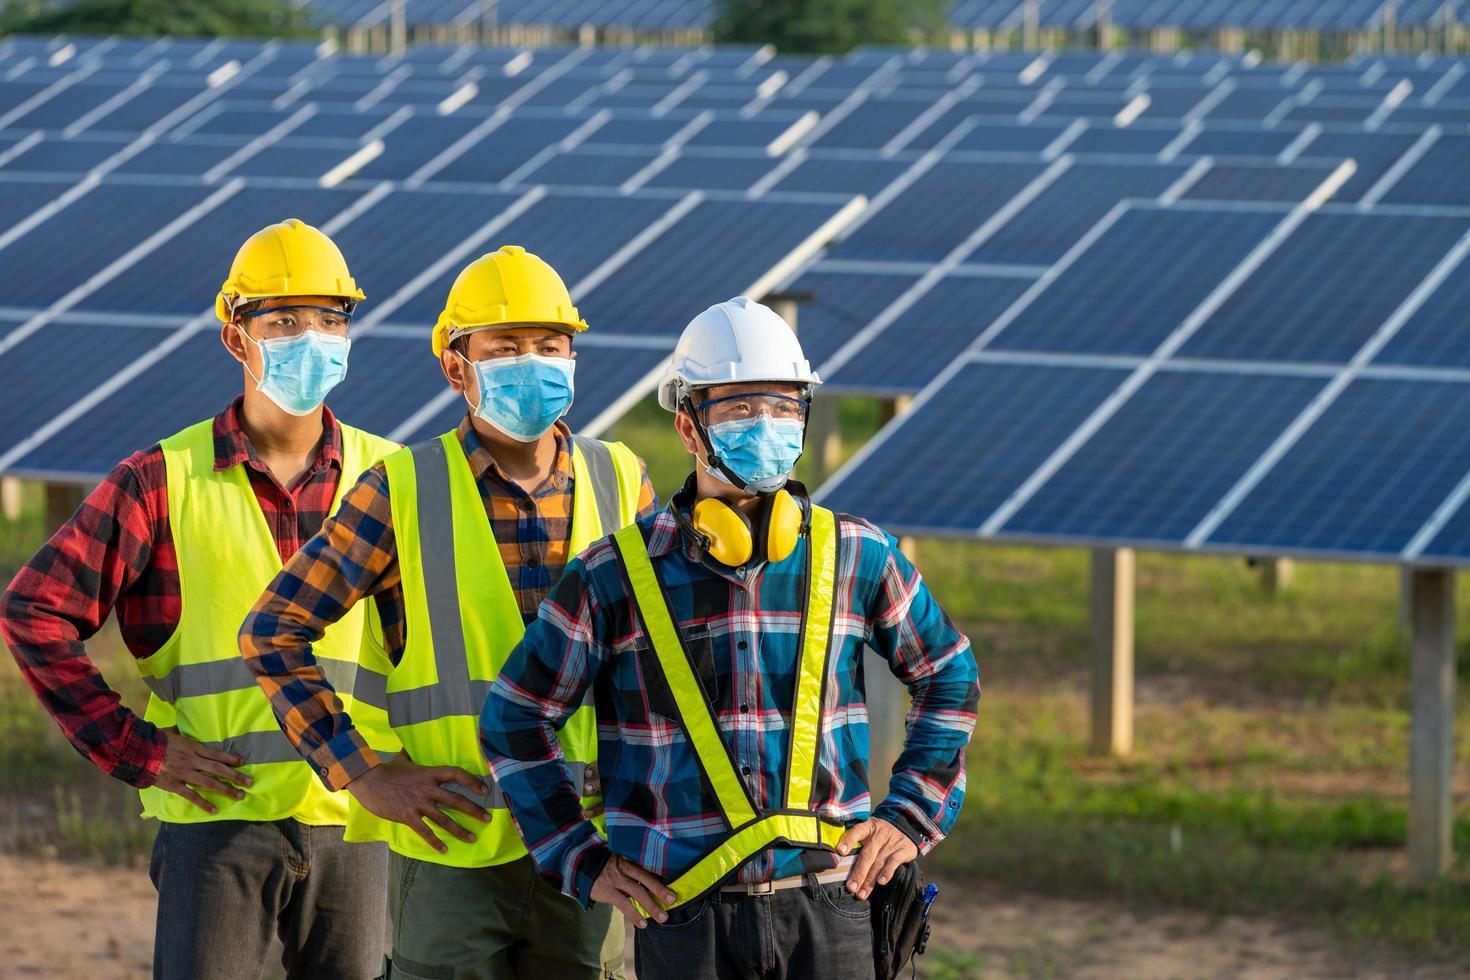 maskierte Arbeiter neben Sonnenkollektoren foto